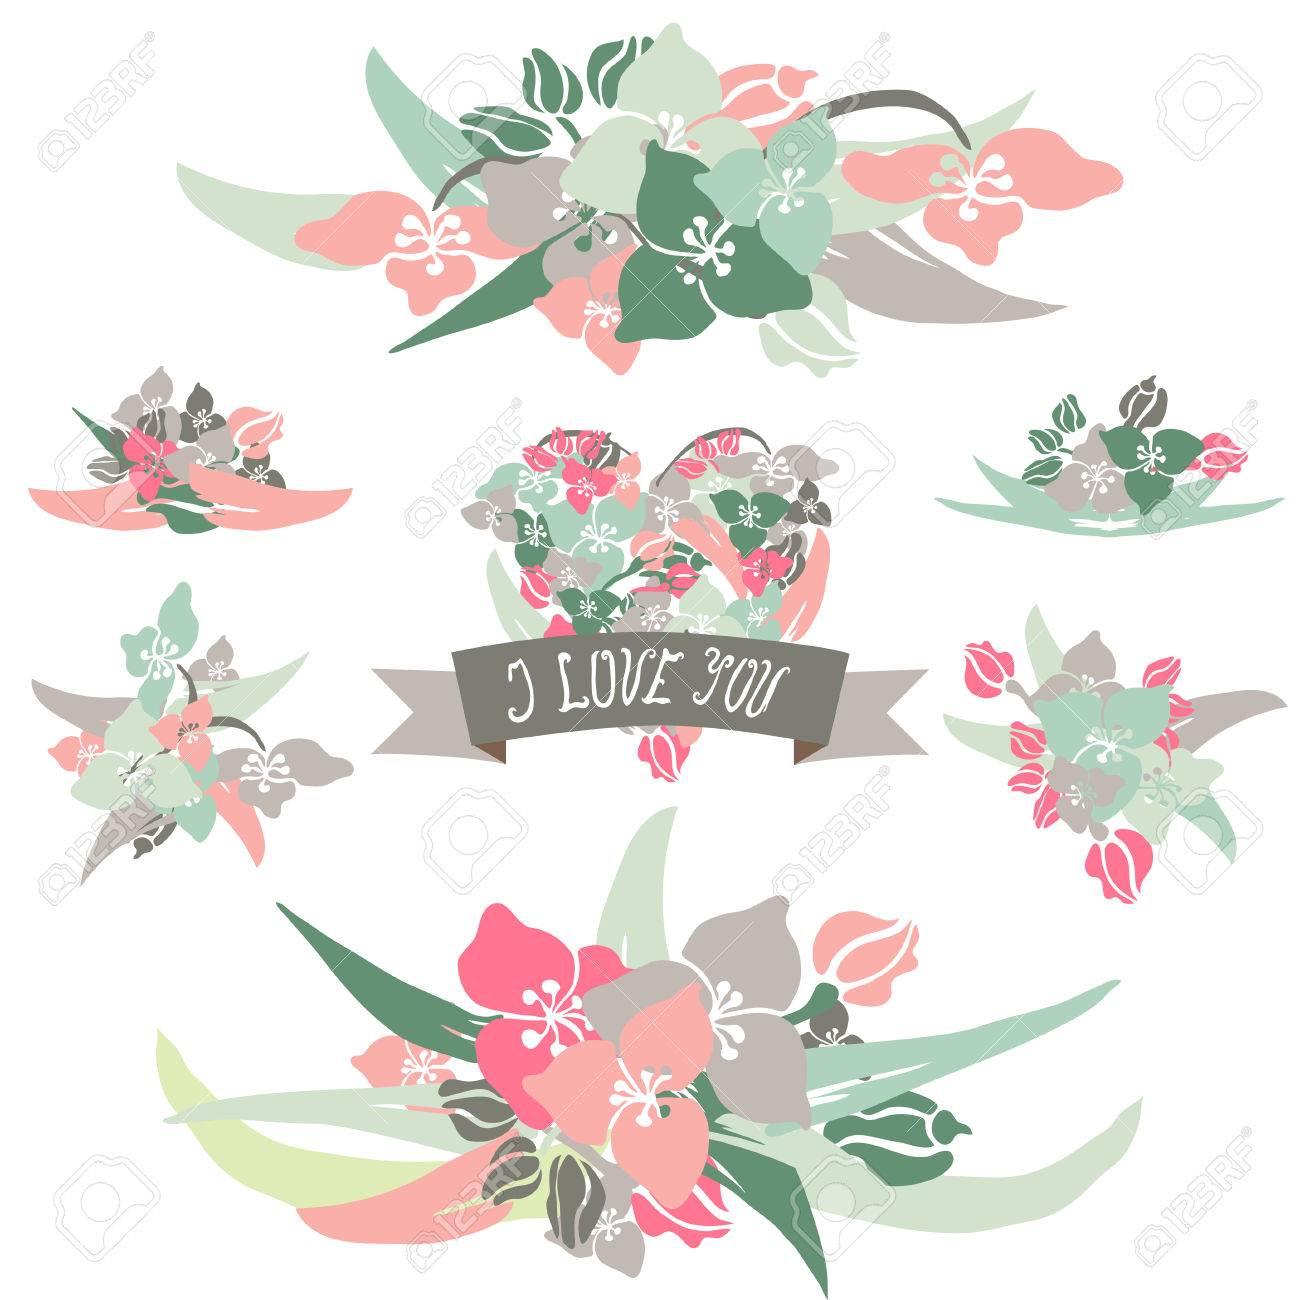 Elegant floral bouquets lily flowers design elements floral elegant floral bouquets lily flowers design elements floral compositions can be used for wedding dhlflorist Images